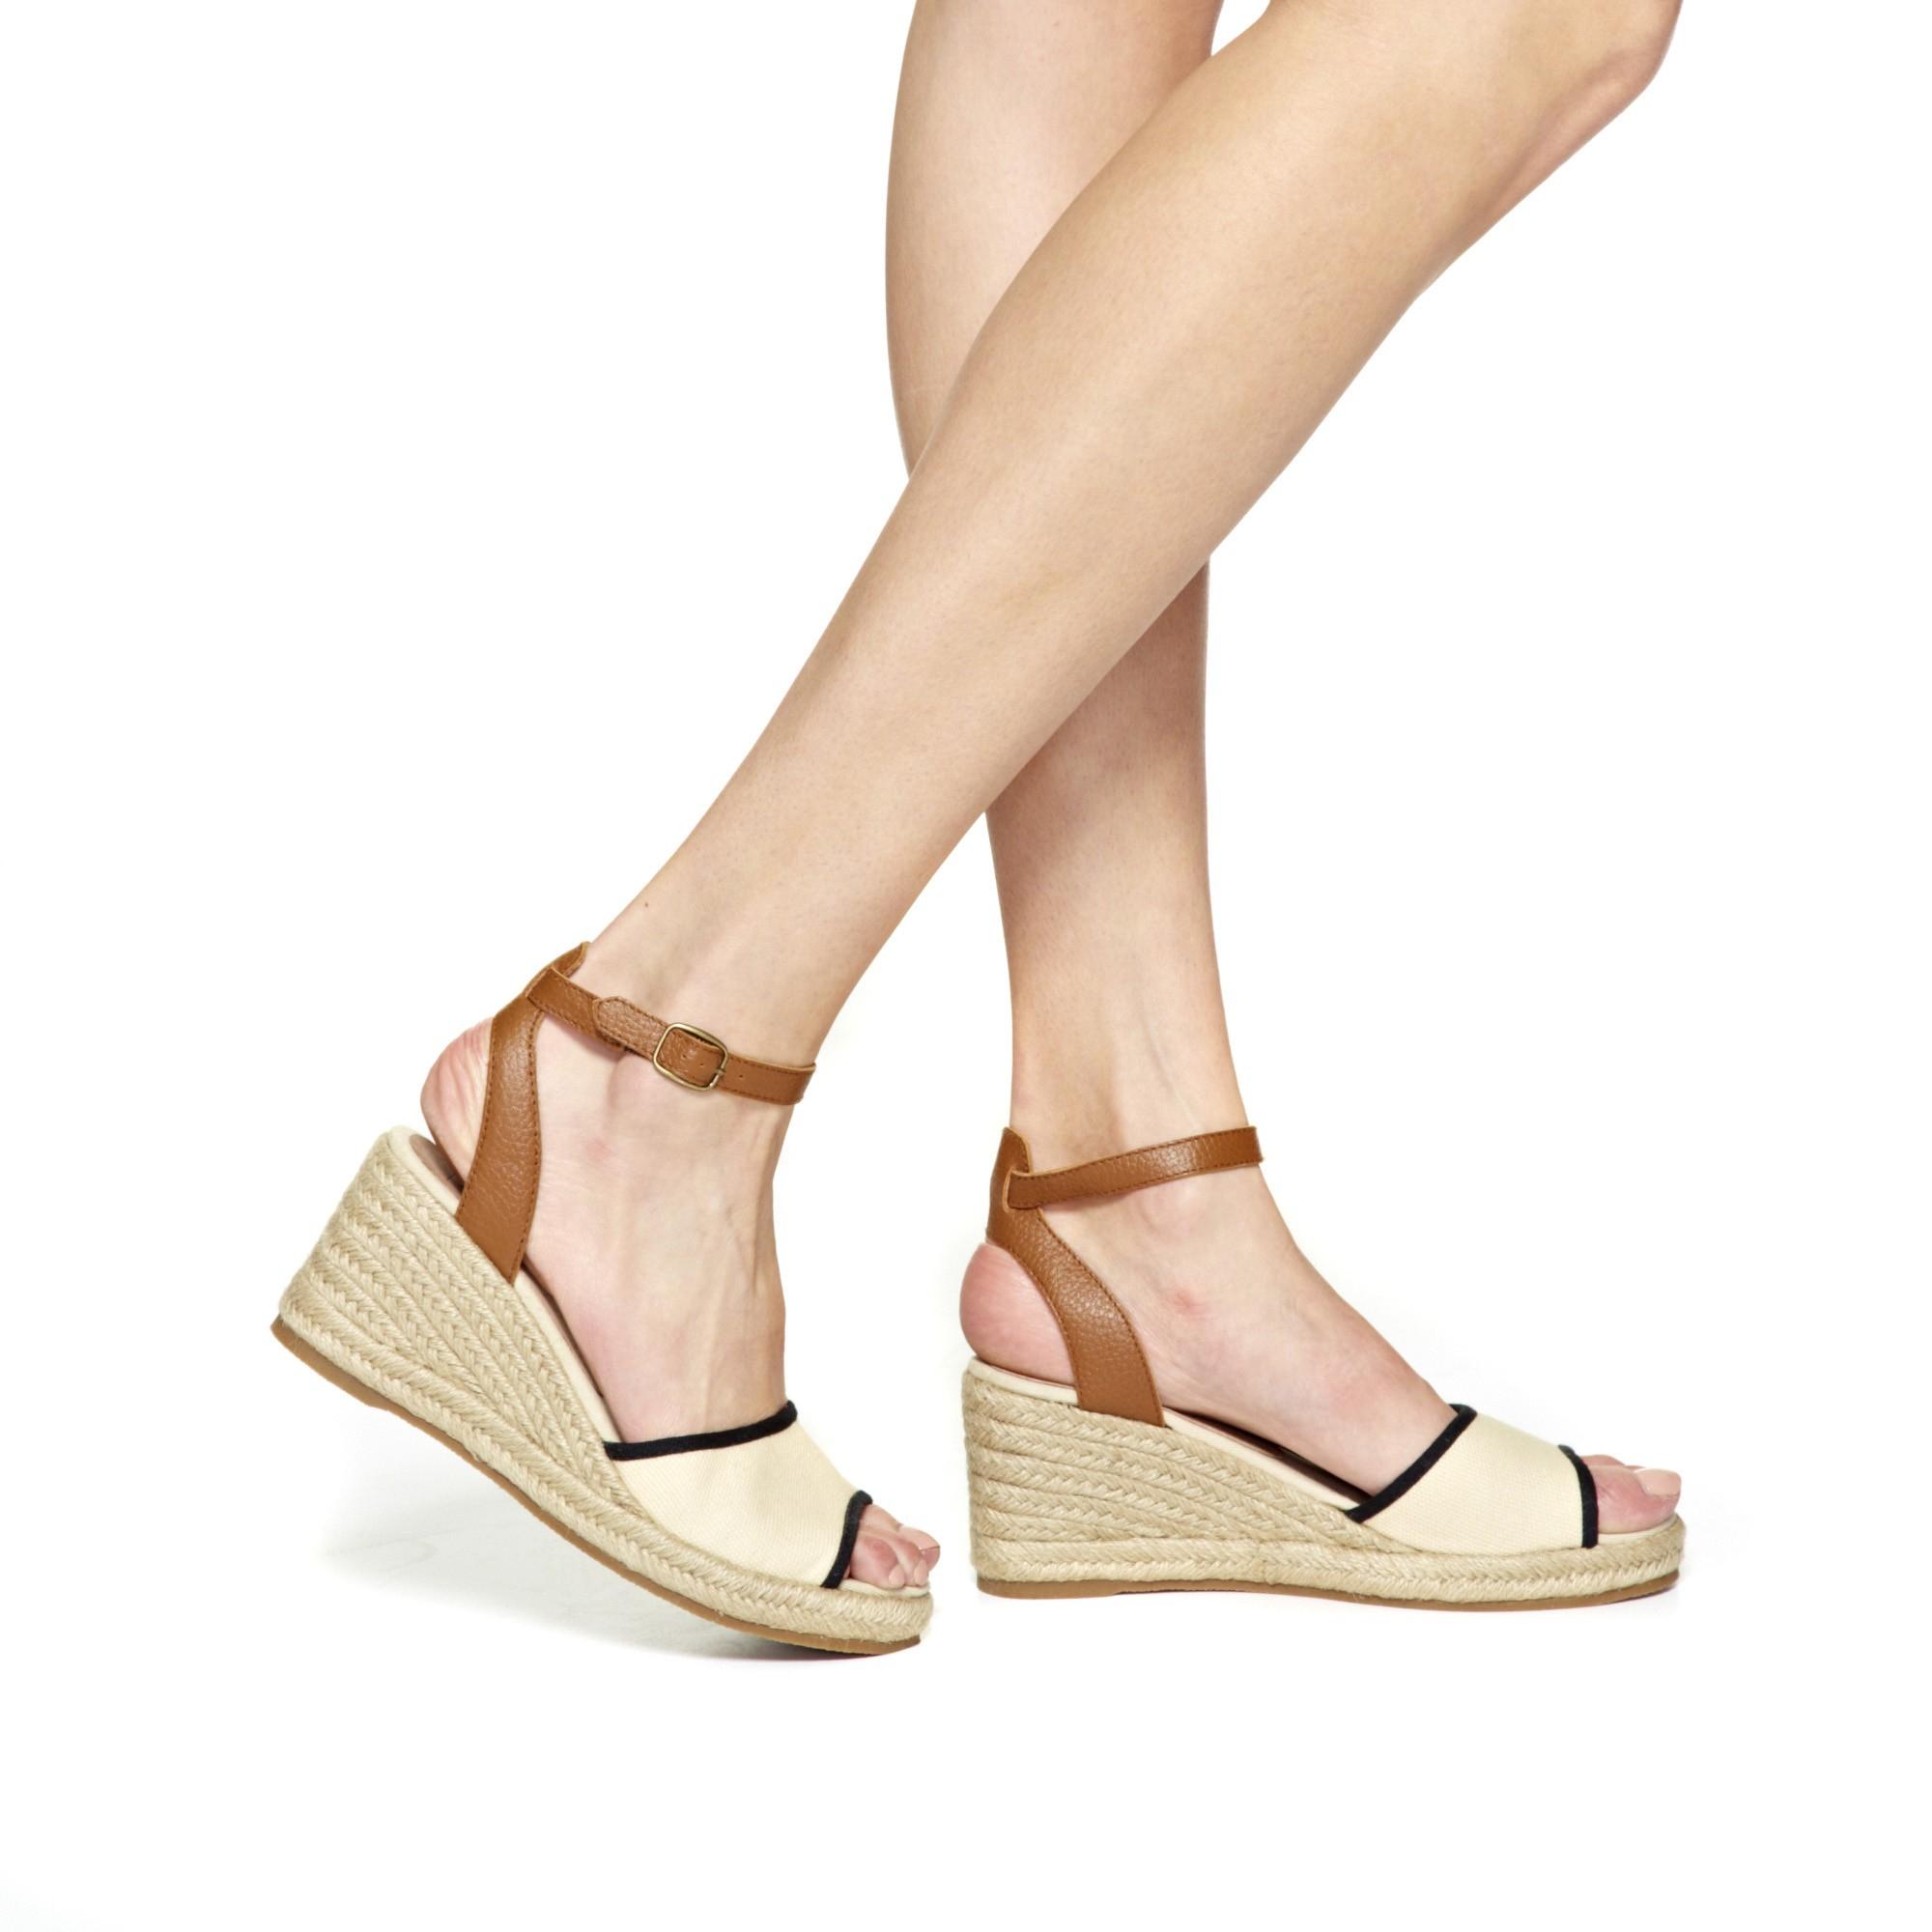 491749896be0 Lyst - Soludos Wedge Classic Stripe Womens Gatsby Sandal Woven Dali ...